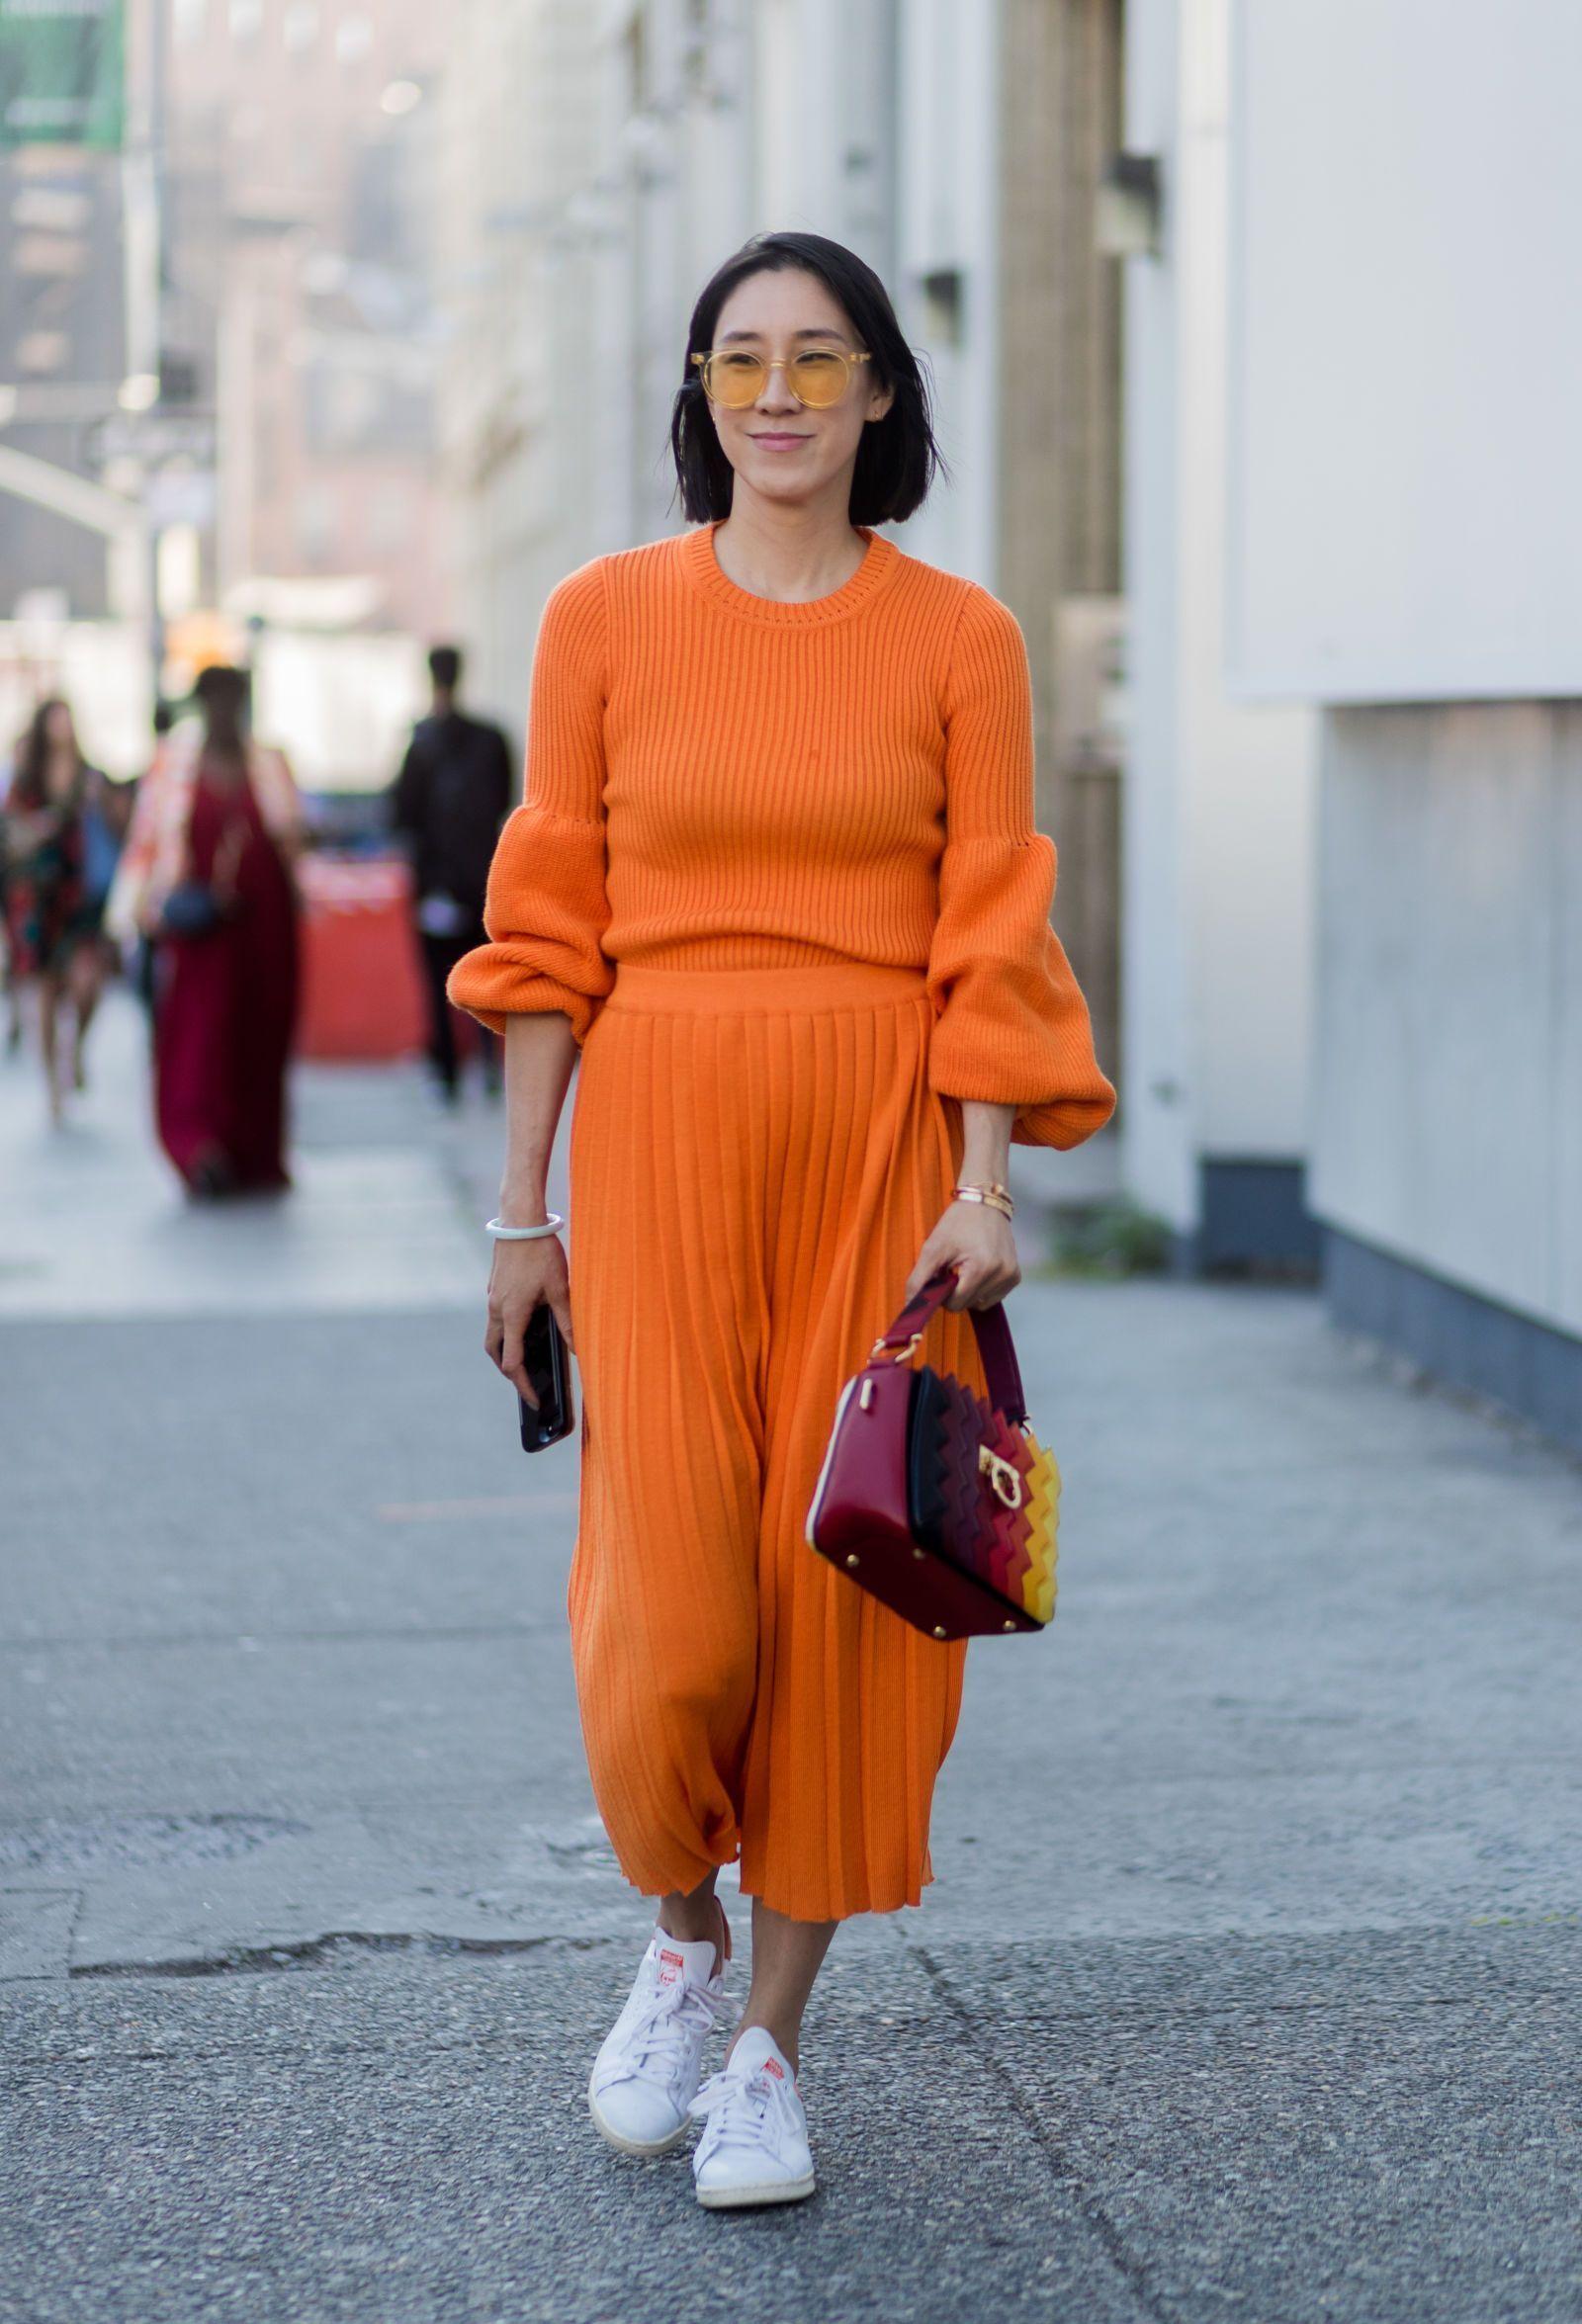 Arti Dibalik Warna-warna Baju yang Kamu Pakai